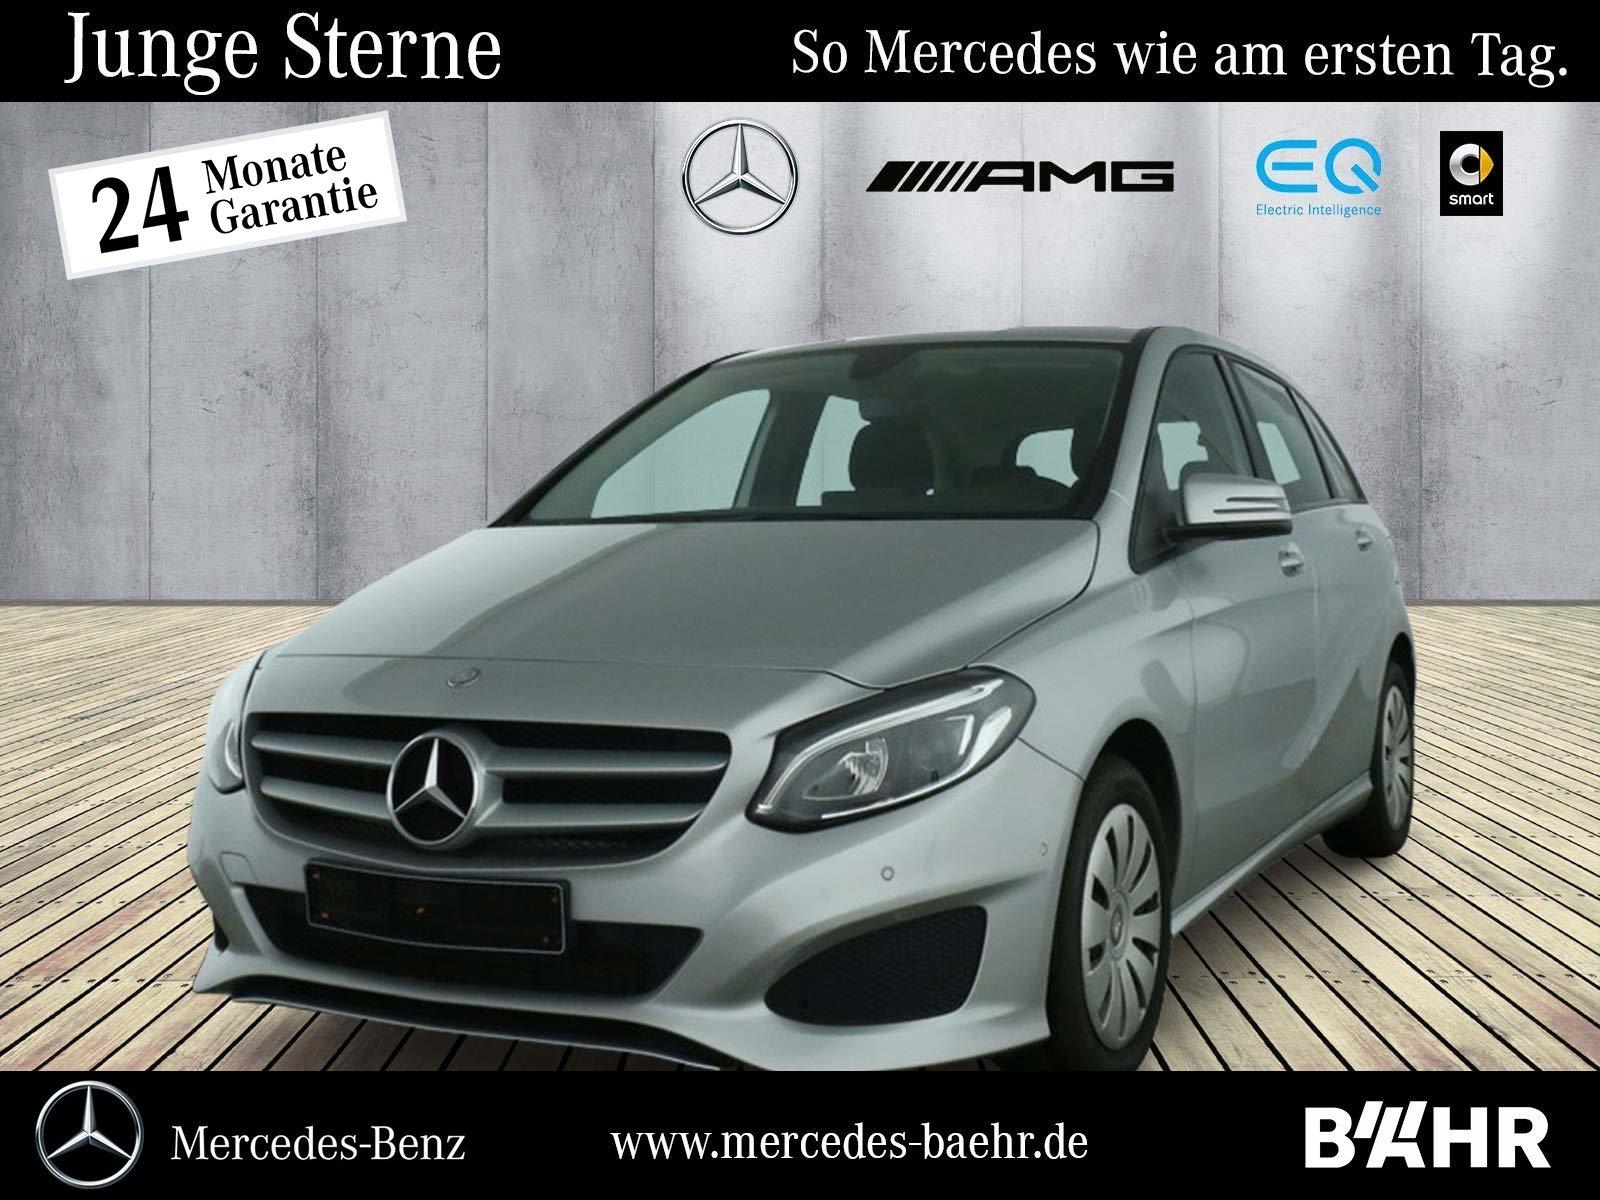 Mercedes-Benz B 220 CDI Navi/LED-High/Parktronic+RFK/SHZ/Klima, Jahr 2014, Diesel